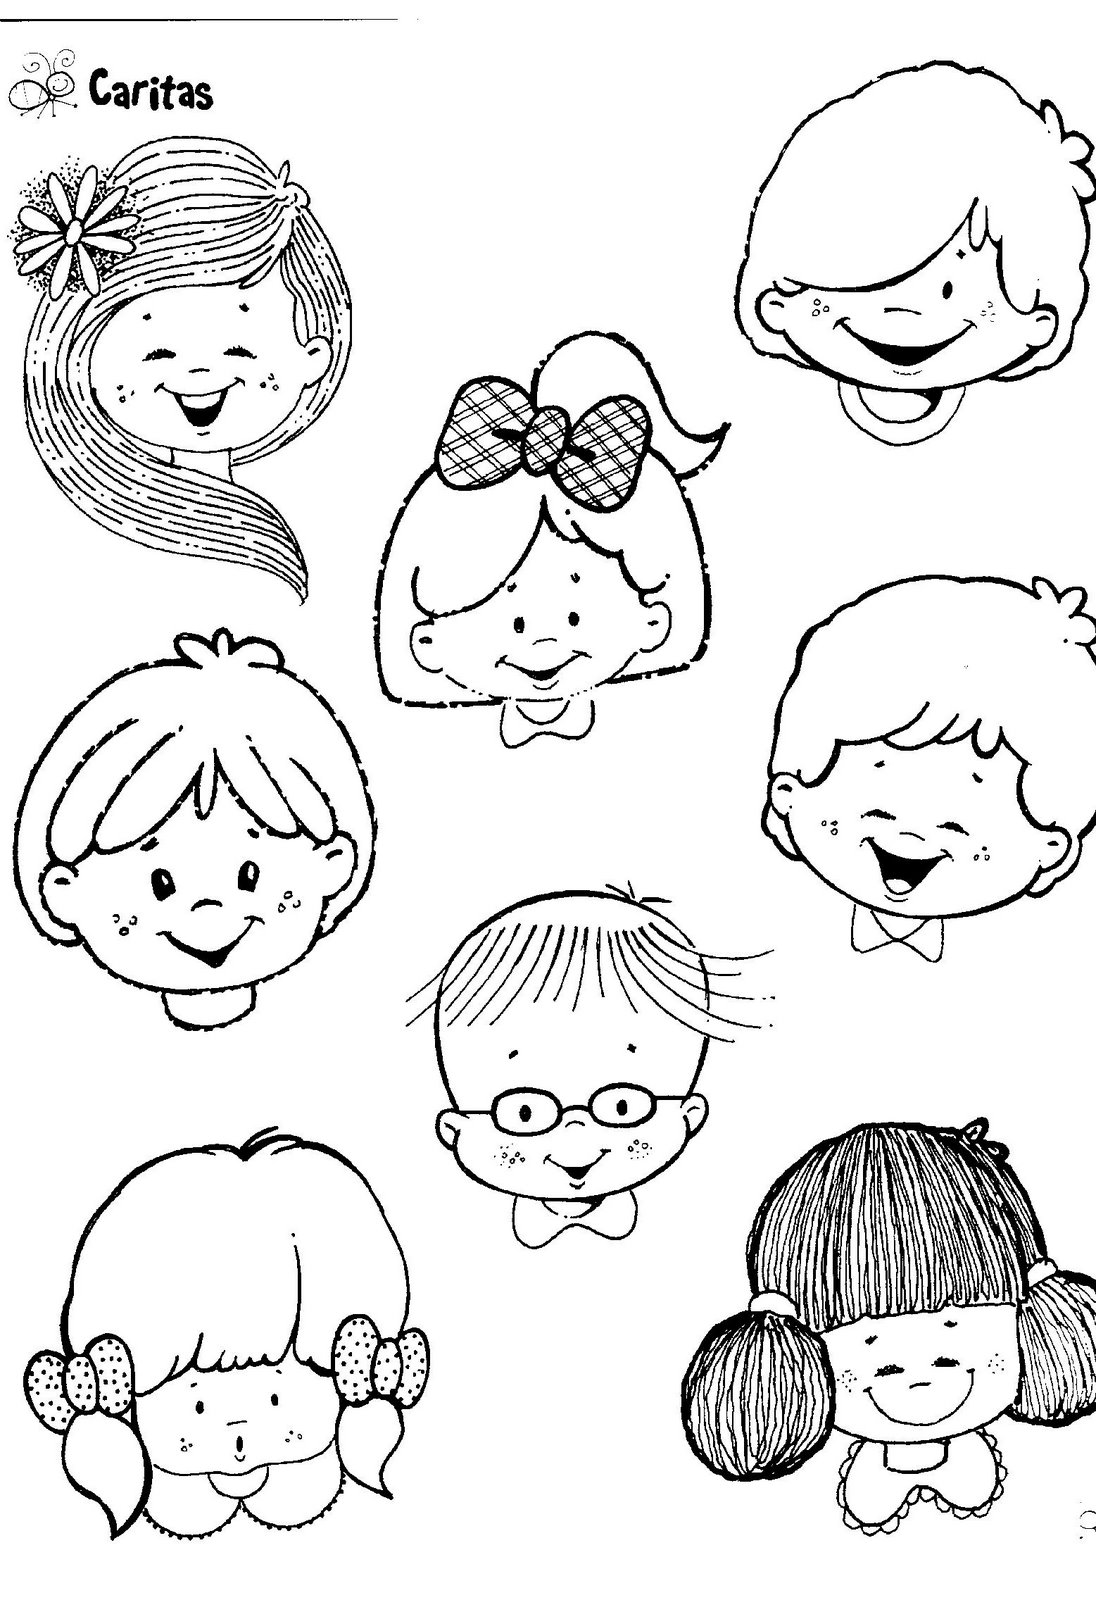 Pin Caritas Para Colorear De Emociones E Imprimir on Pinterest